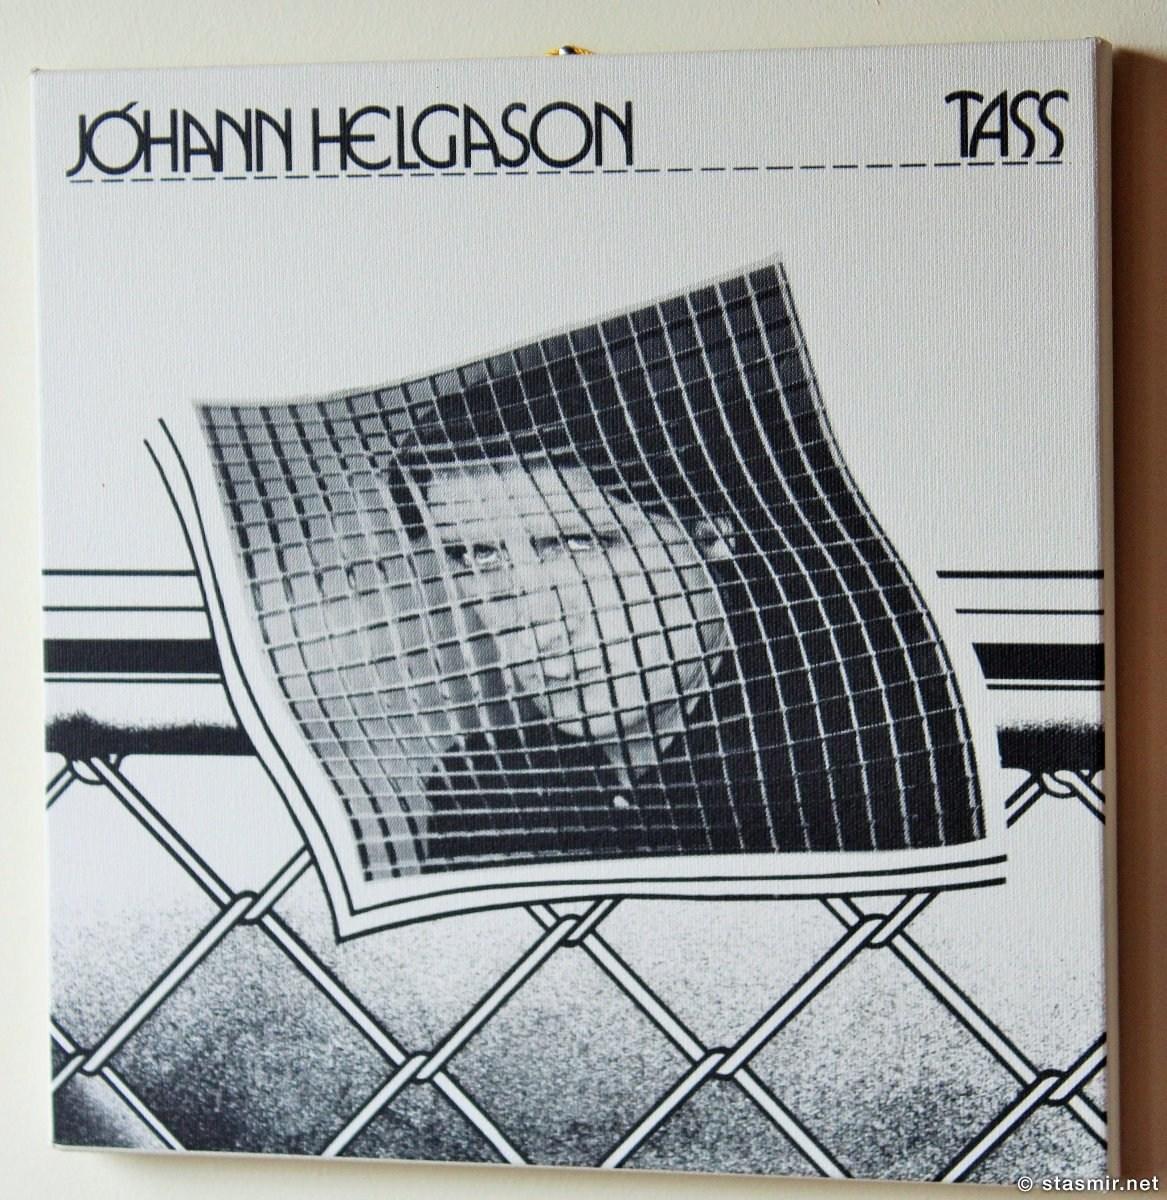 Jóhann Helgason, альбом Тасс, Troll-and-Roll в районе Борганес, фото Стасмир, photo Stasmir, Troll'n'Roll